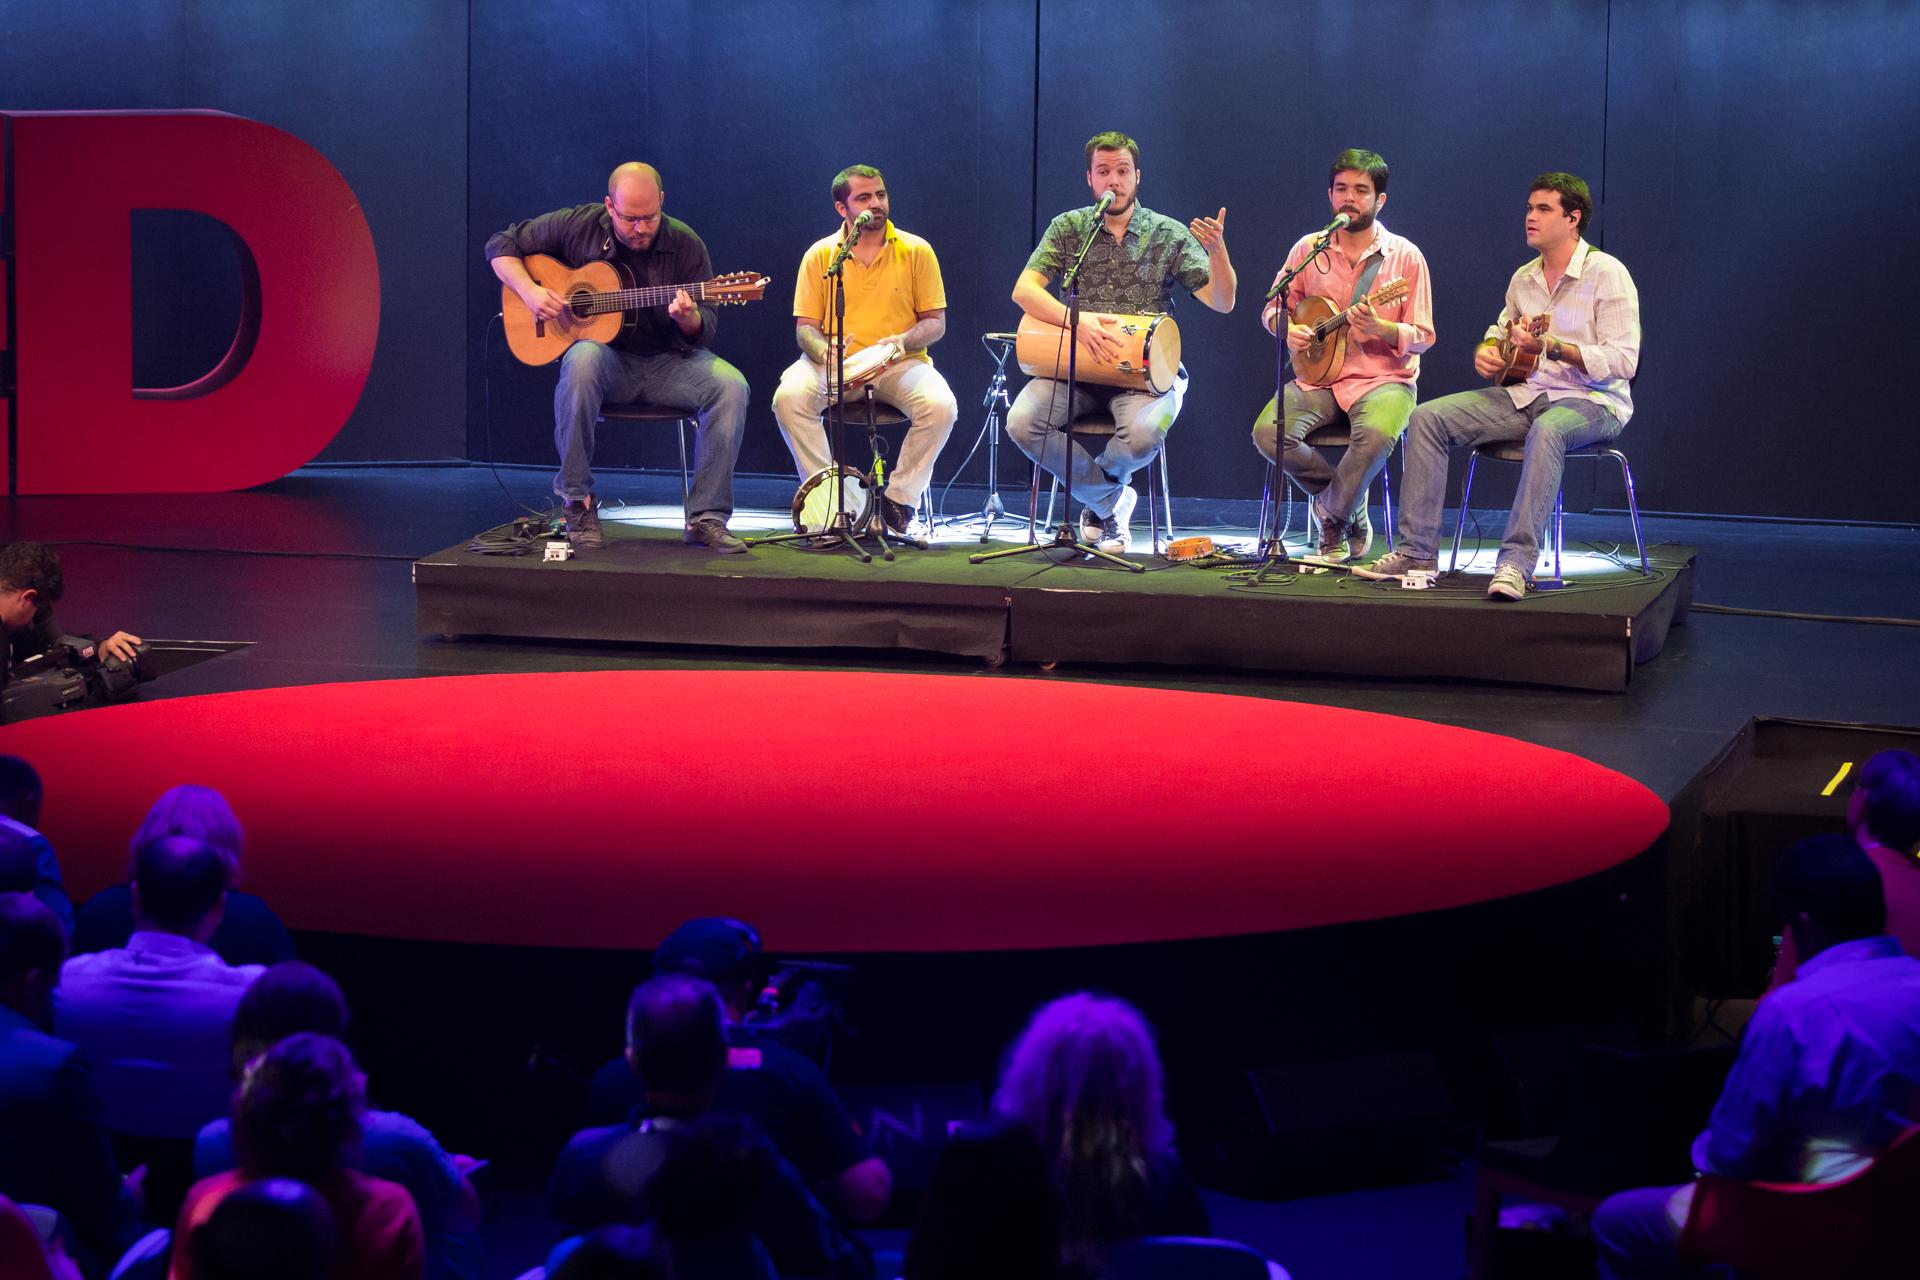 Casuarina perform at TEDGlobal 2014. Photo: James Duncan Davidson/TED